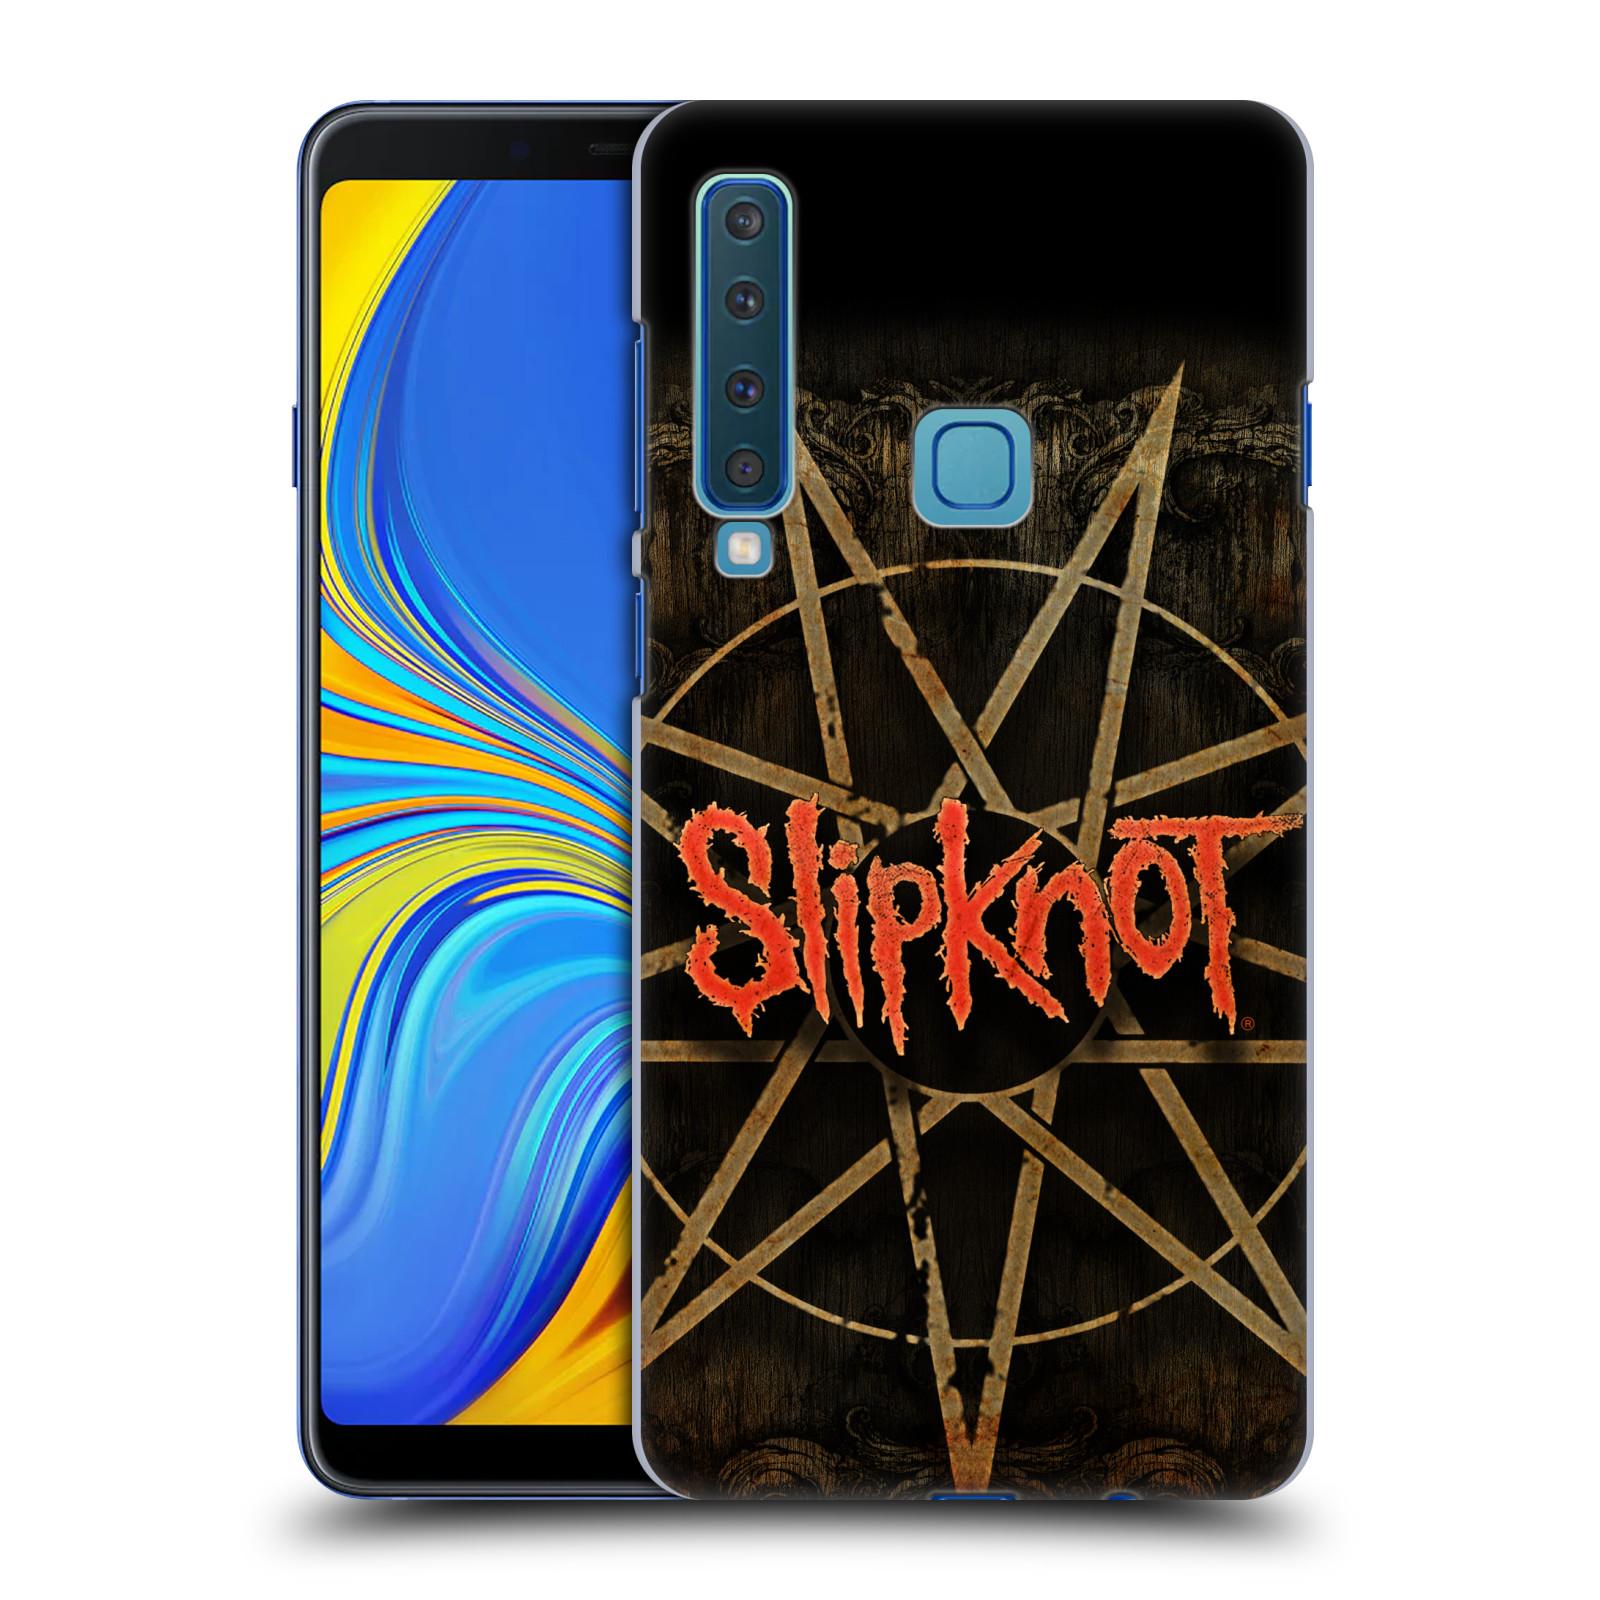 Plastové pouzdro na mobil Samsung Galaxy A9 (2018) - Head Case - Slipknot - Znak